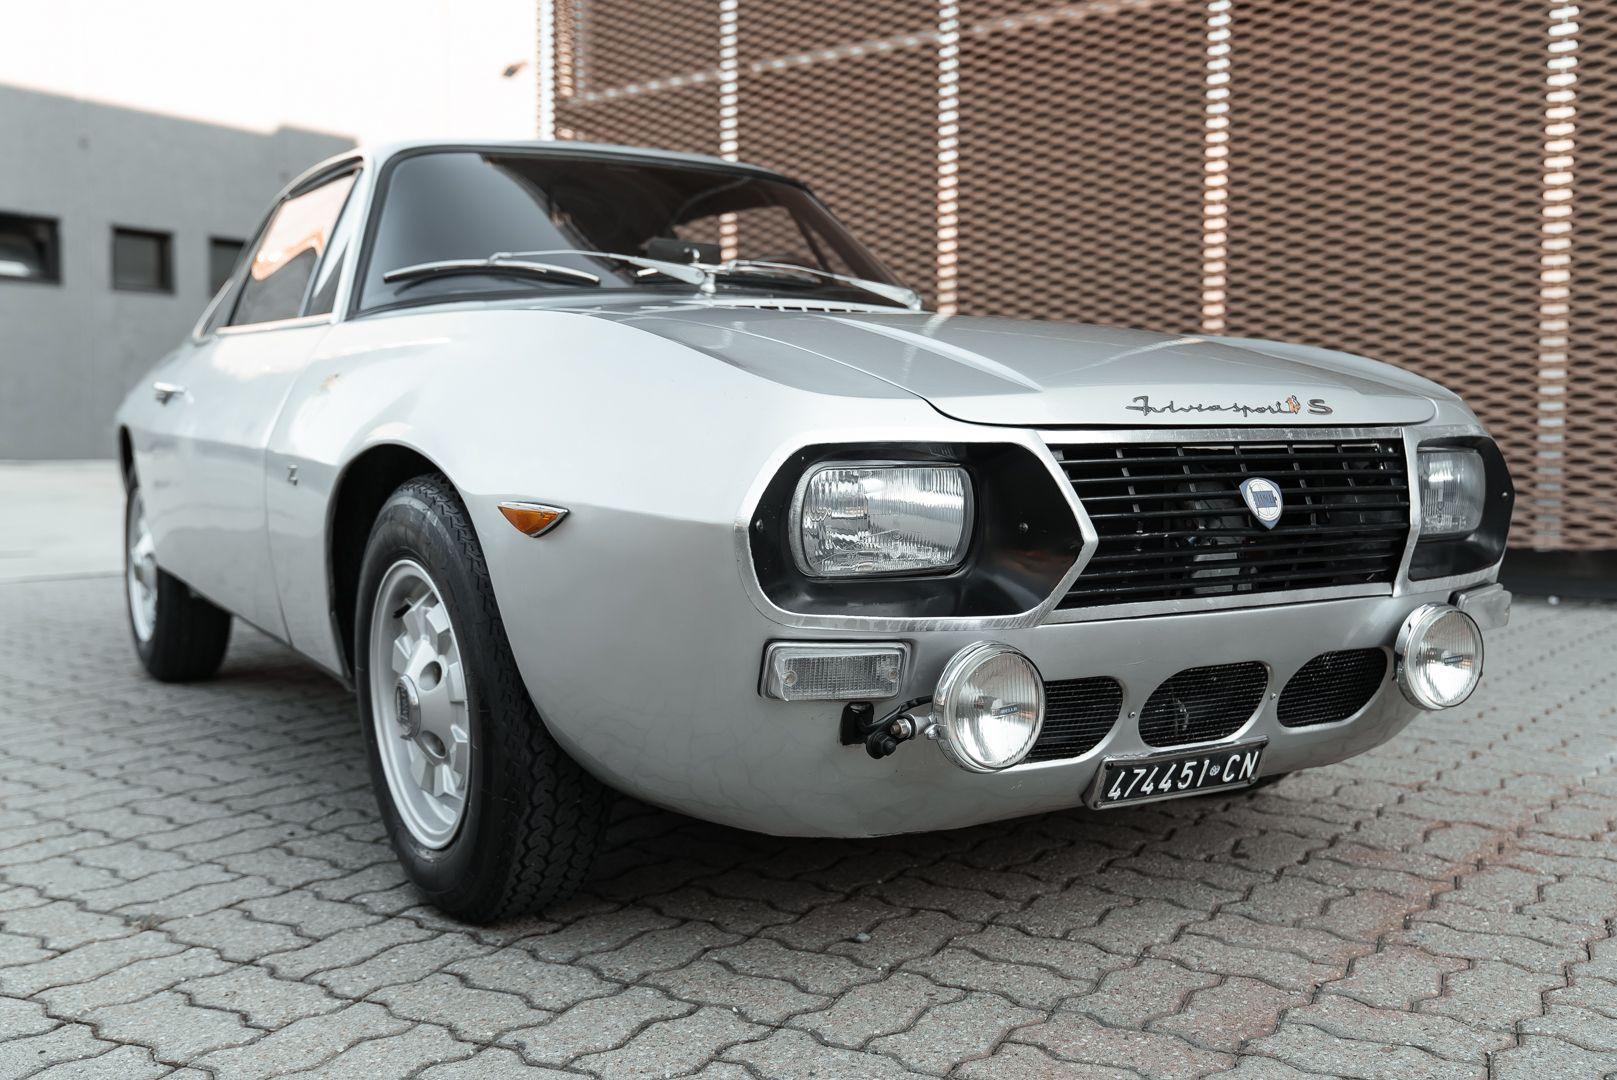 1972 Lancia Fulvia Sport 1.3 S 79366